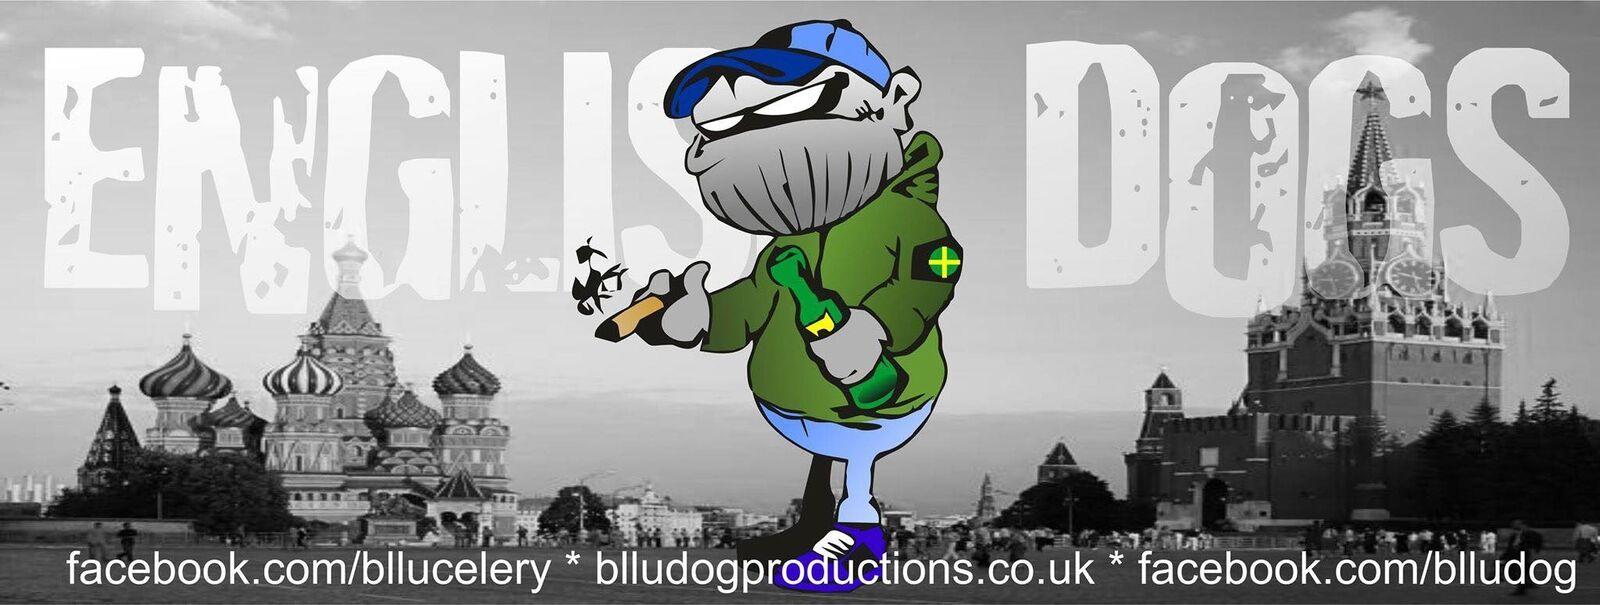 Blludog Productions